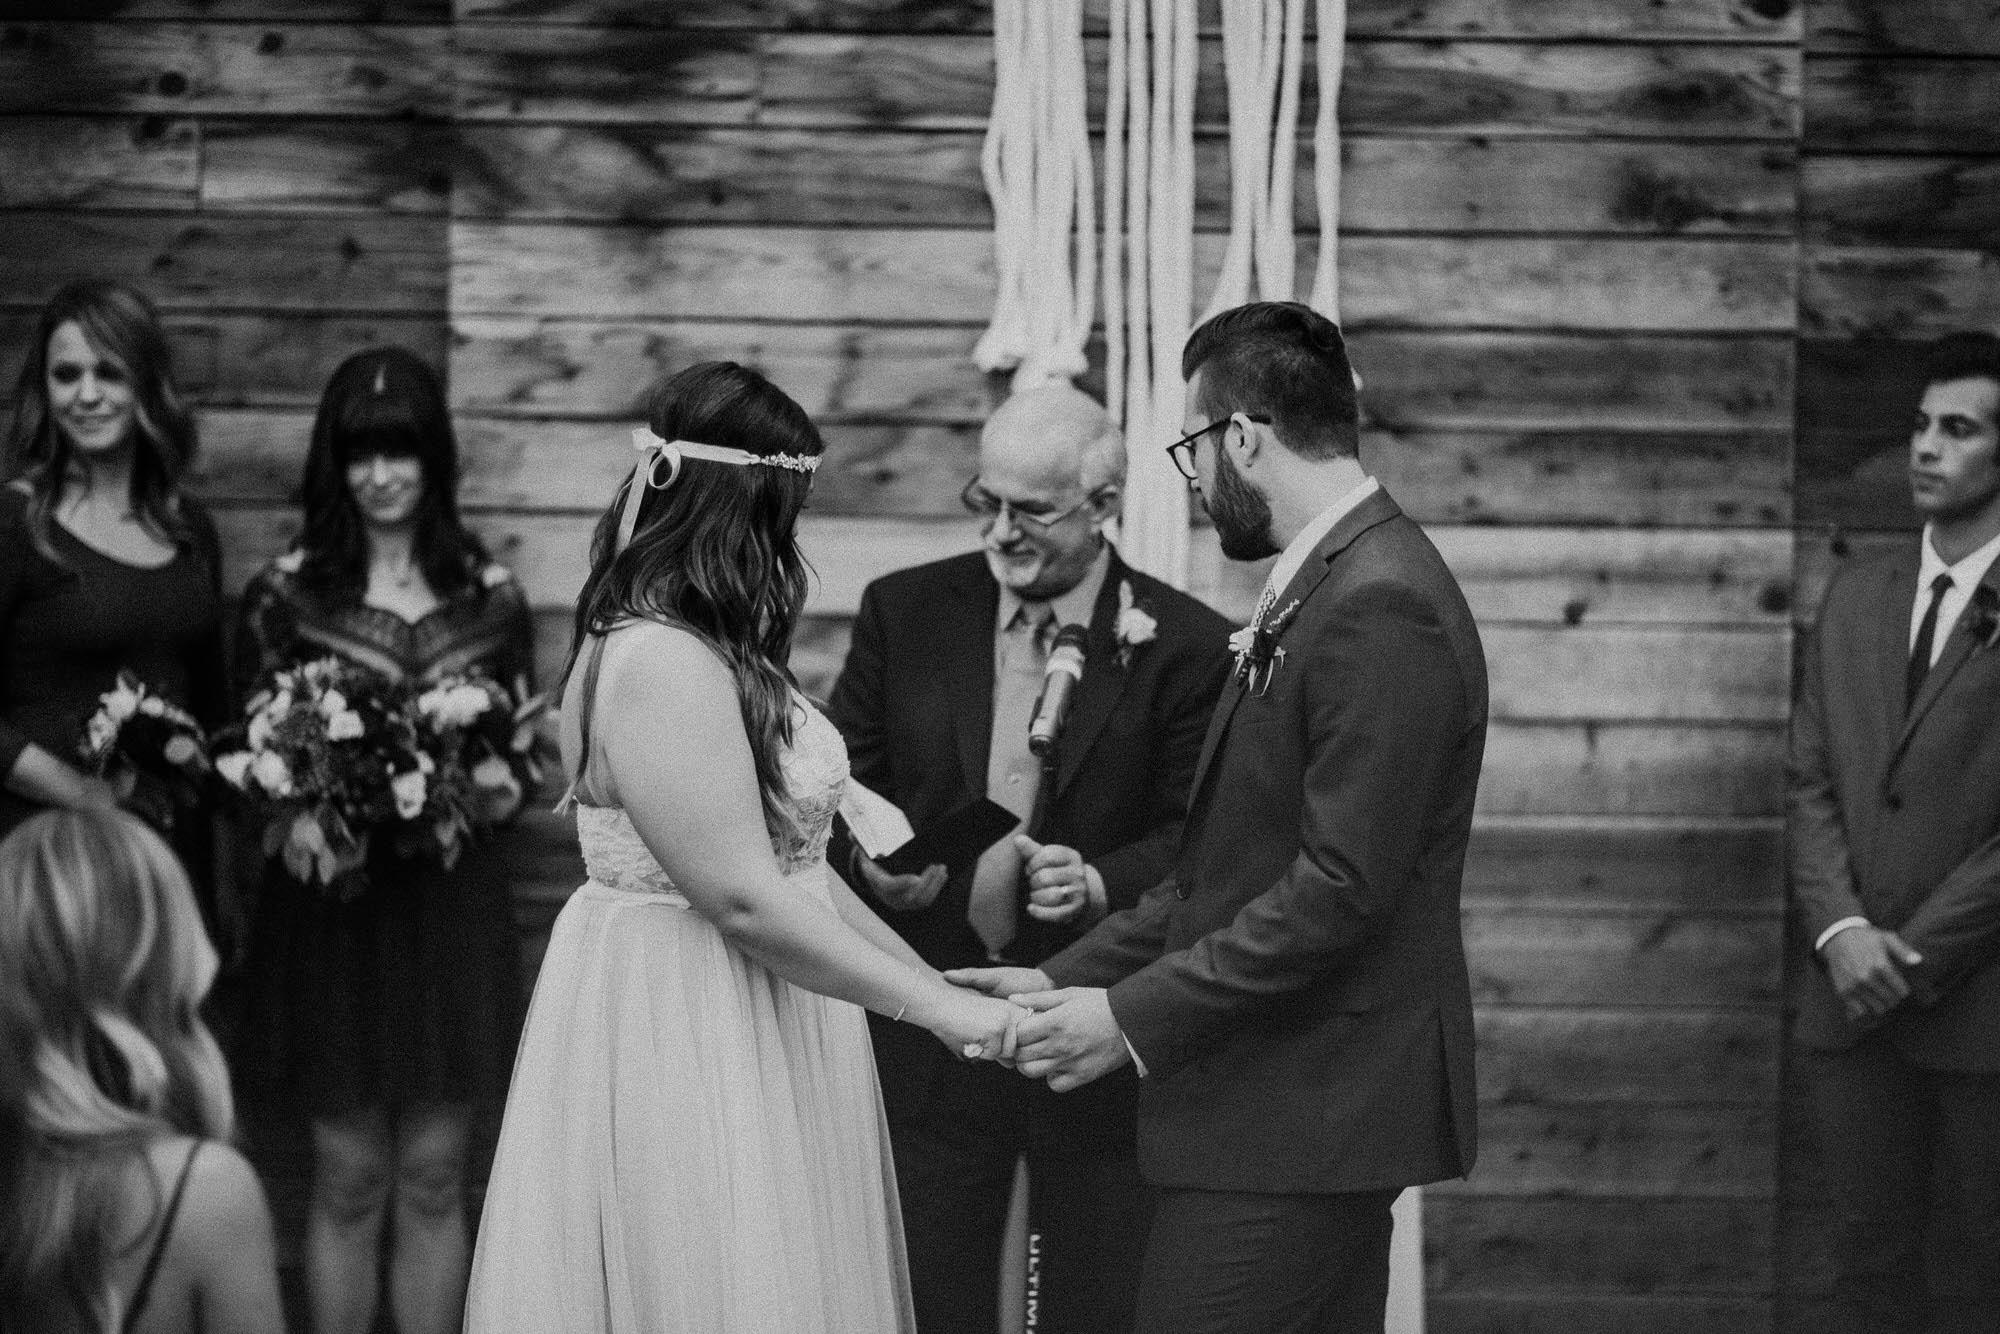 los-angeles-wedding-photographer-kristen-dylan-65.jpg